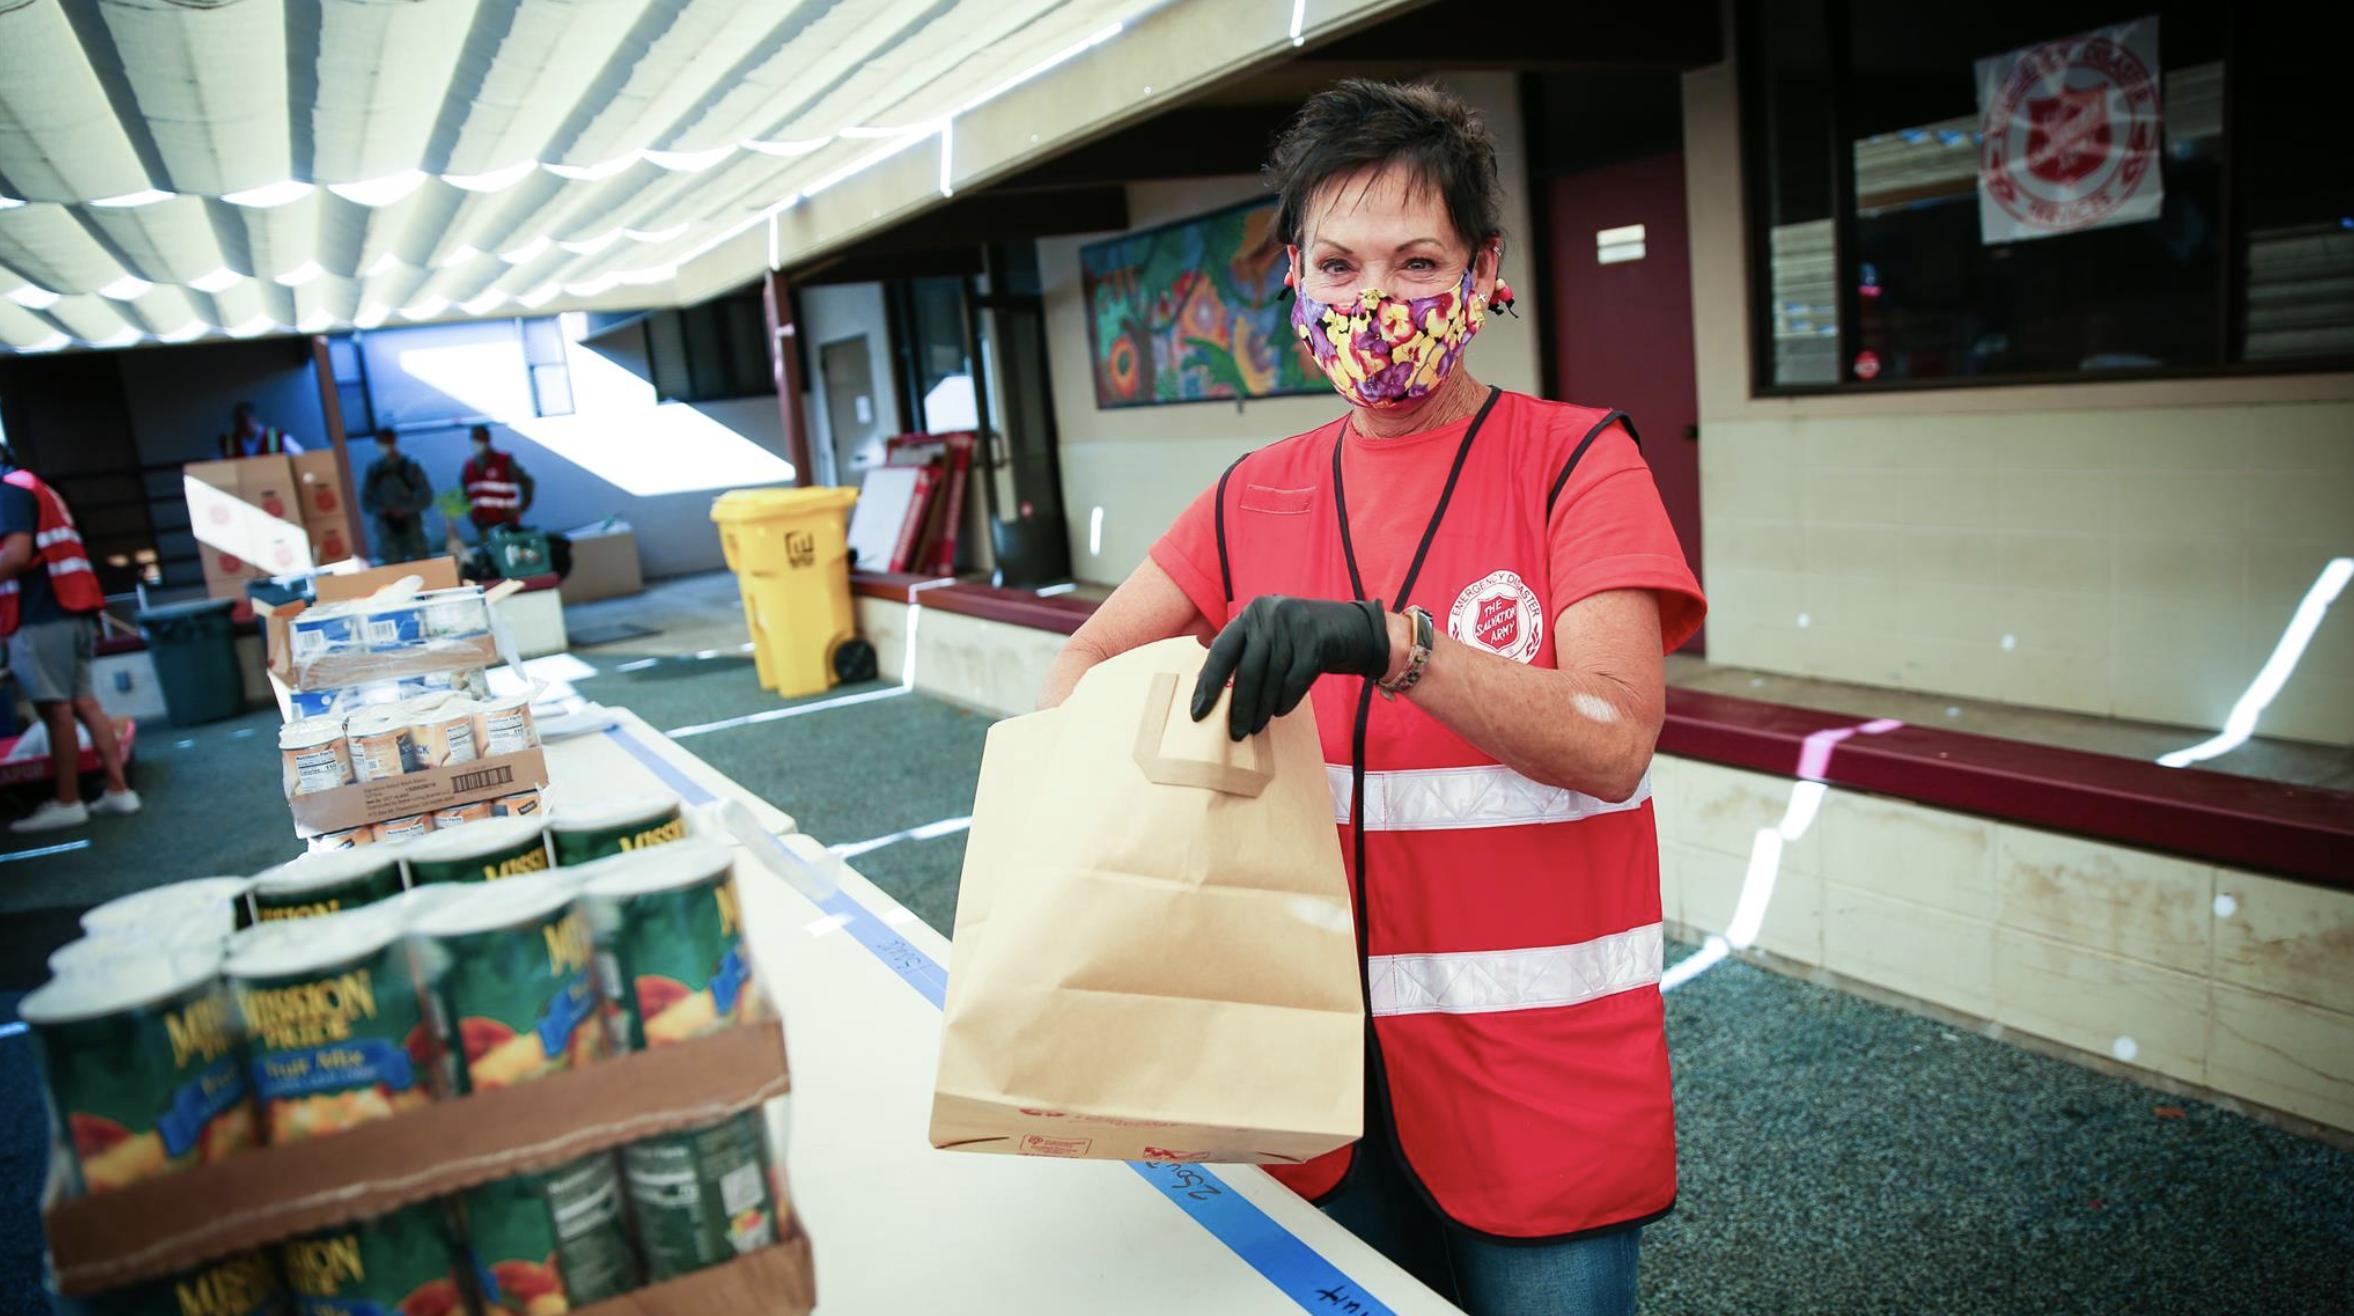 Volunteer Safety